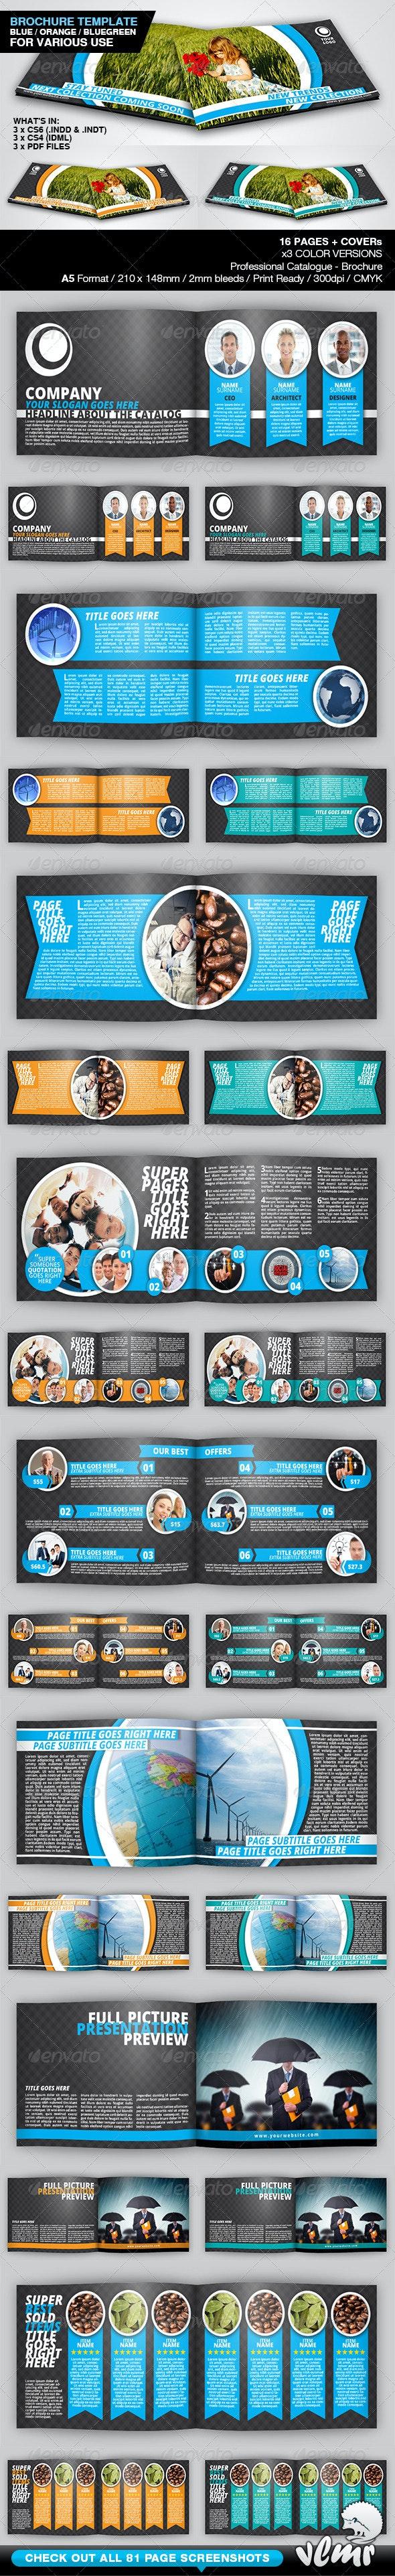 Universal A5 Brochure / Catalog Template - Corporate Brochures